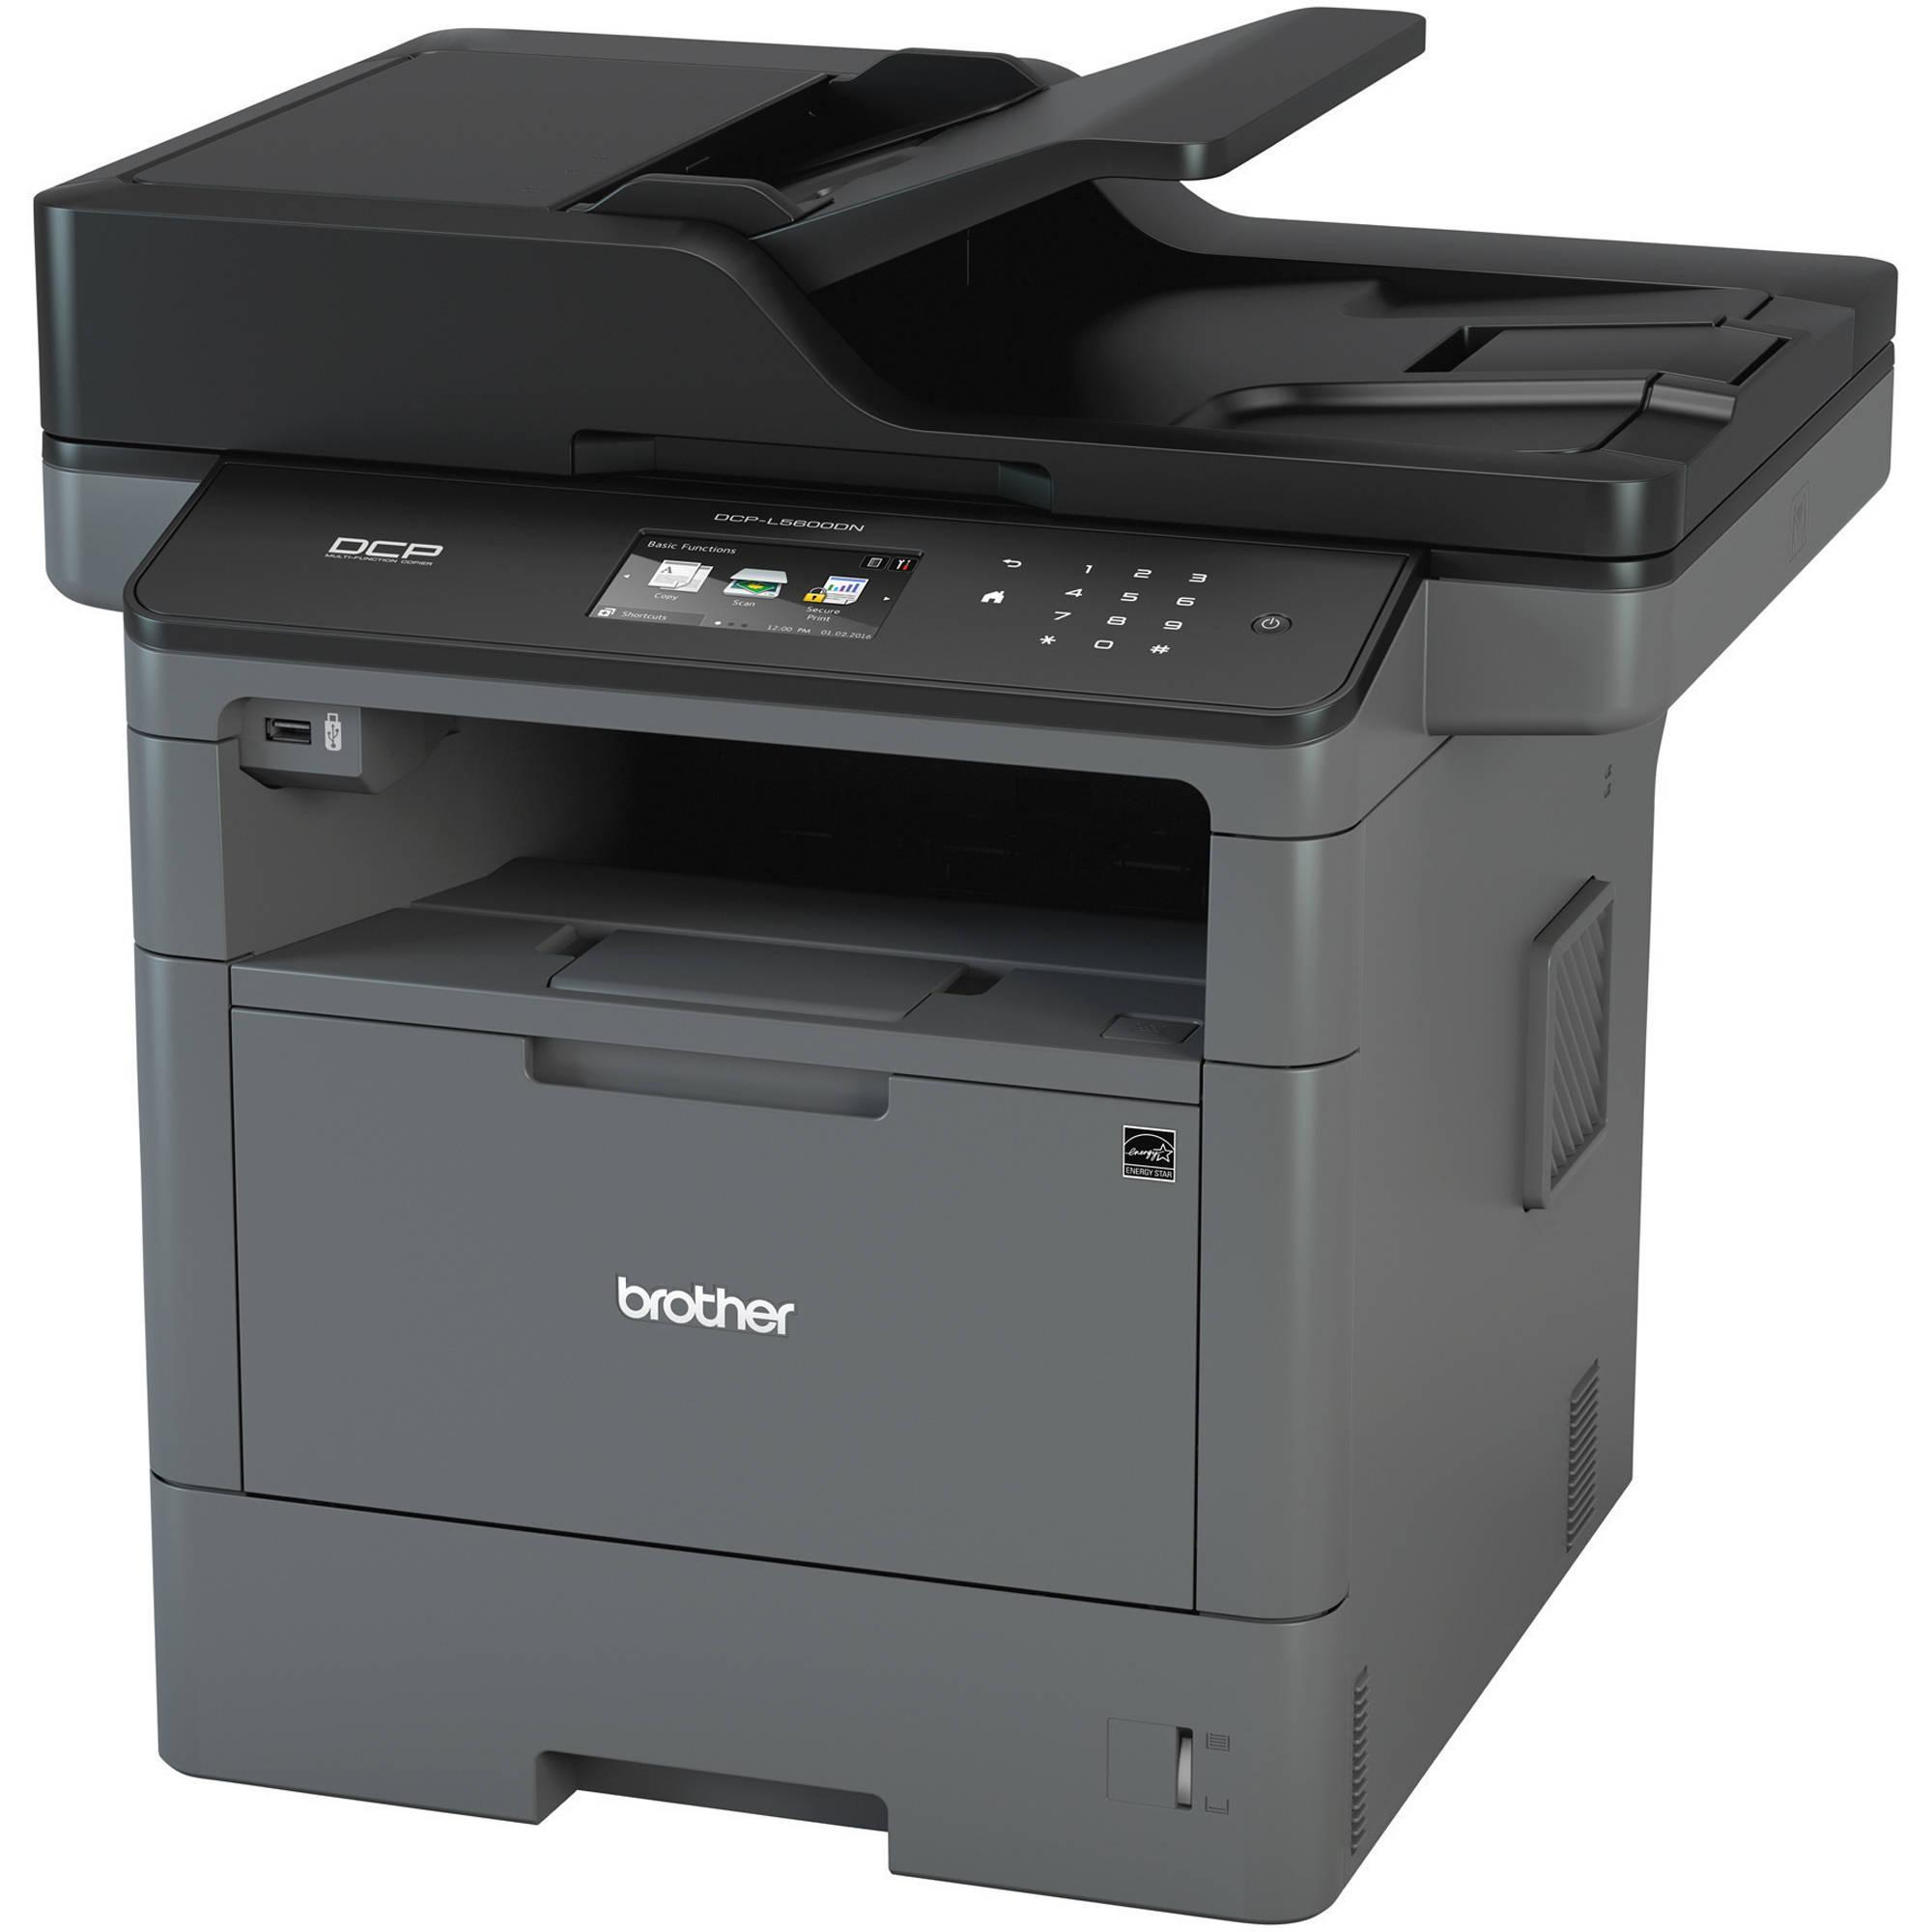 Máy in Brother DCP-L5600DN, In, Scan, Copy, Duplex, Netwwork, Laser trắng đen